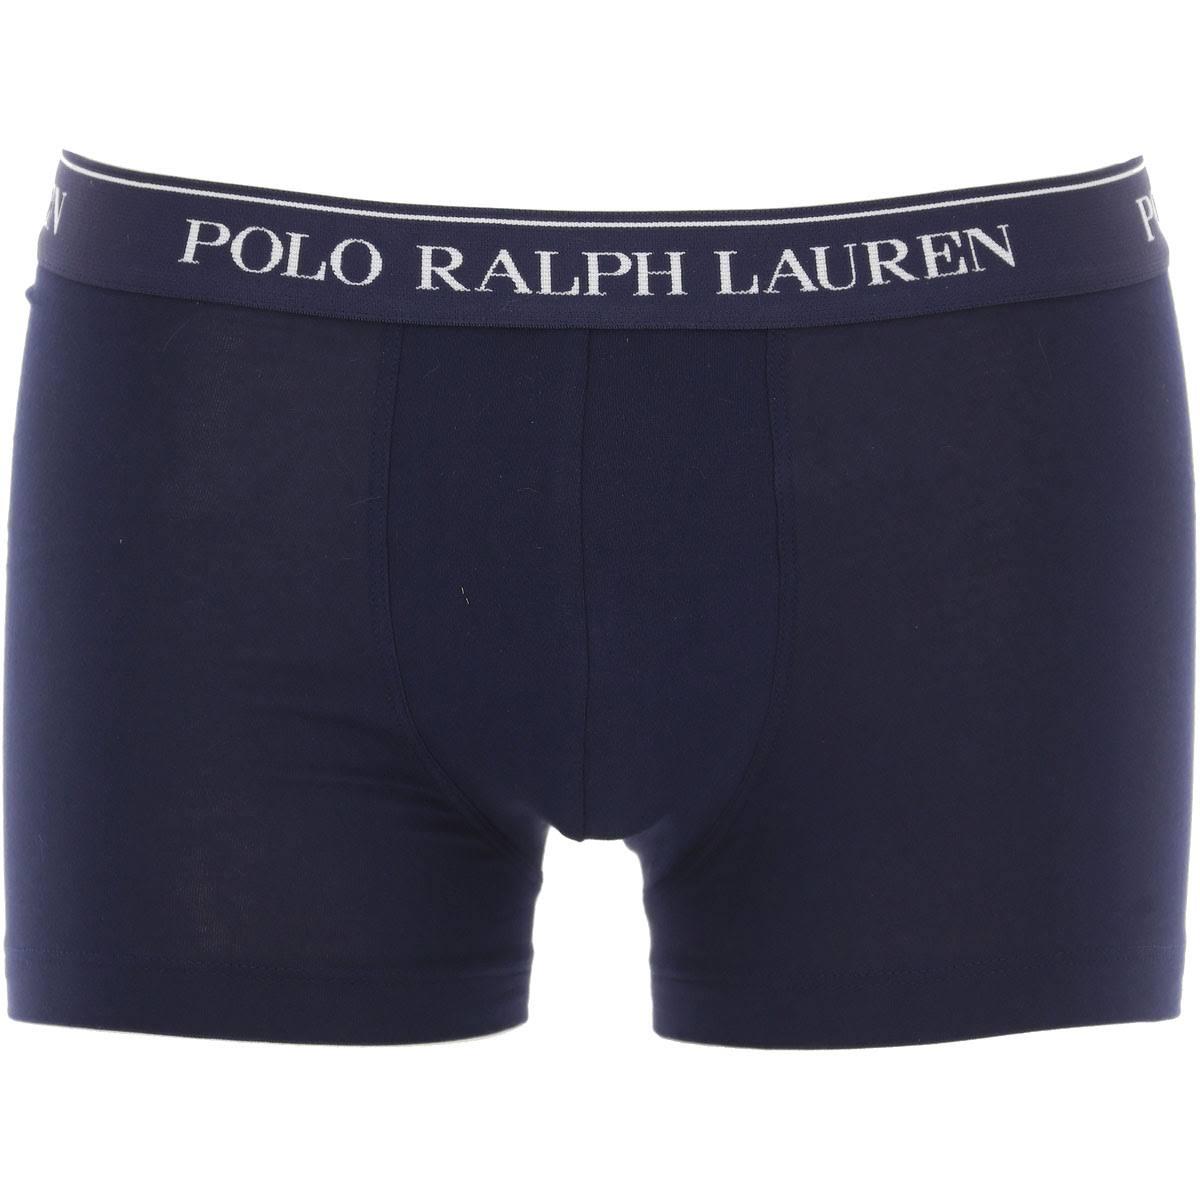 Polo Boxer Ralph Lauren Viele Pink 3 qg8zwWAq